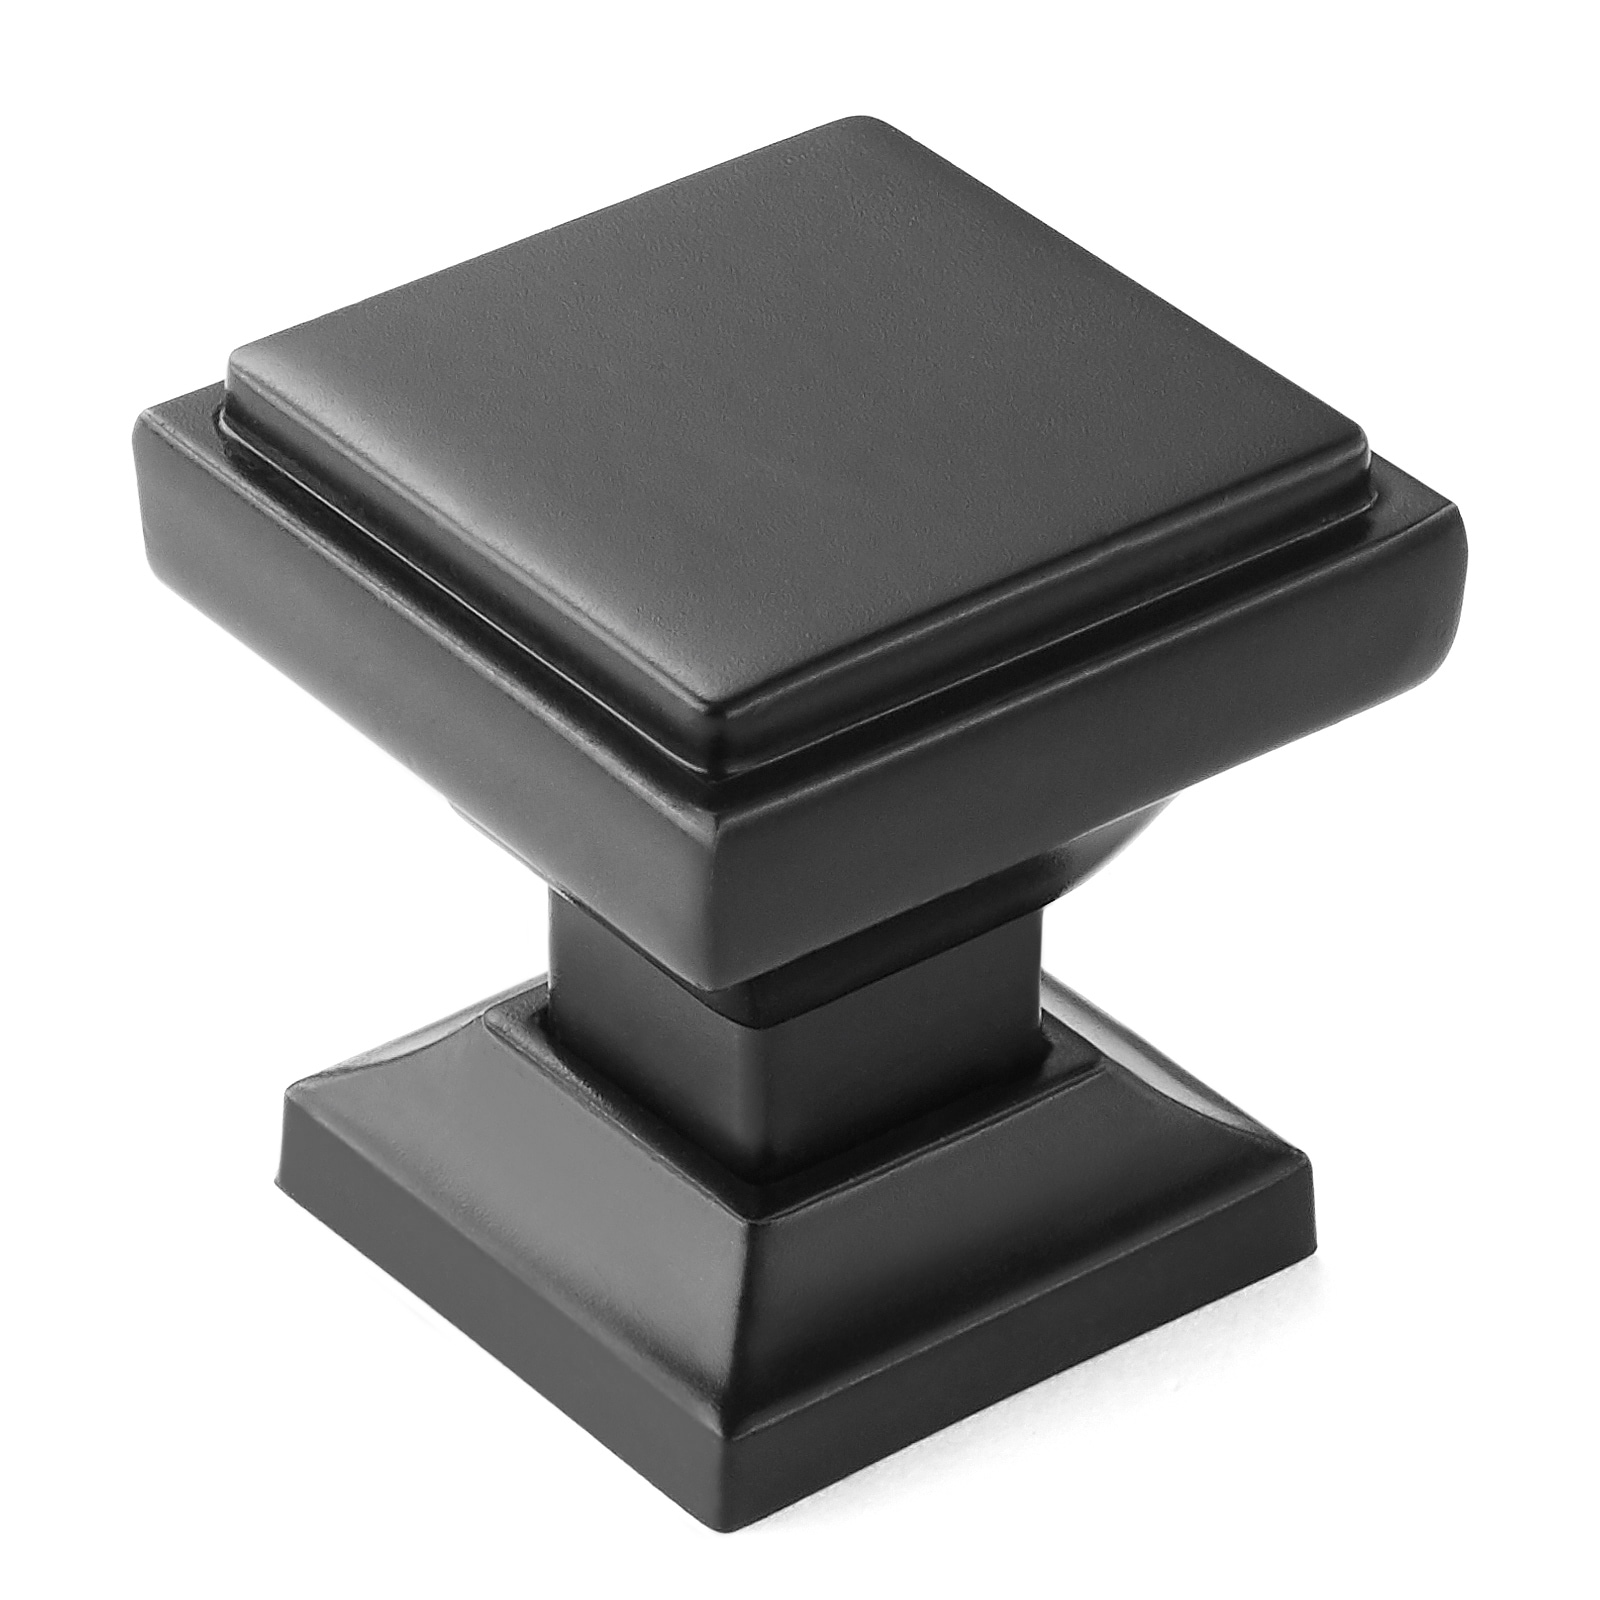 Solid Square 1 1 8 Matte Black Kitchen Cabinet Knobs Pulls On Sale Overstock 31114038